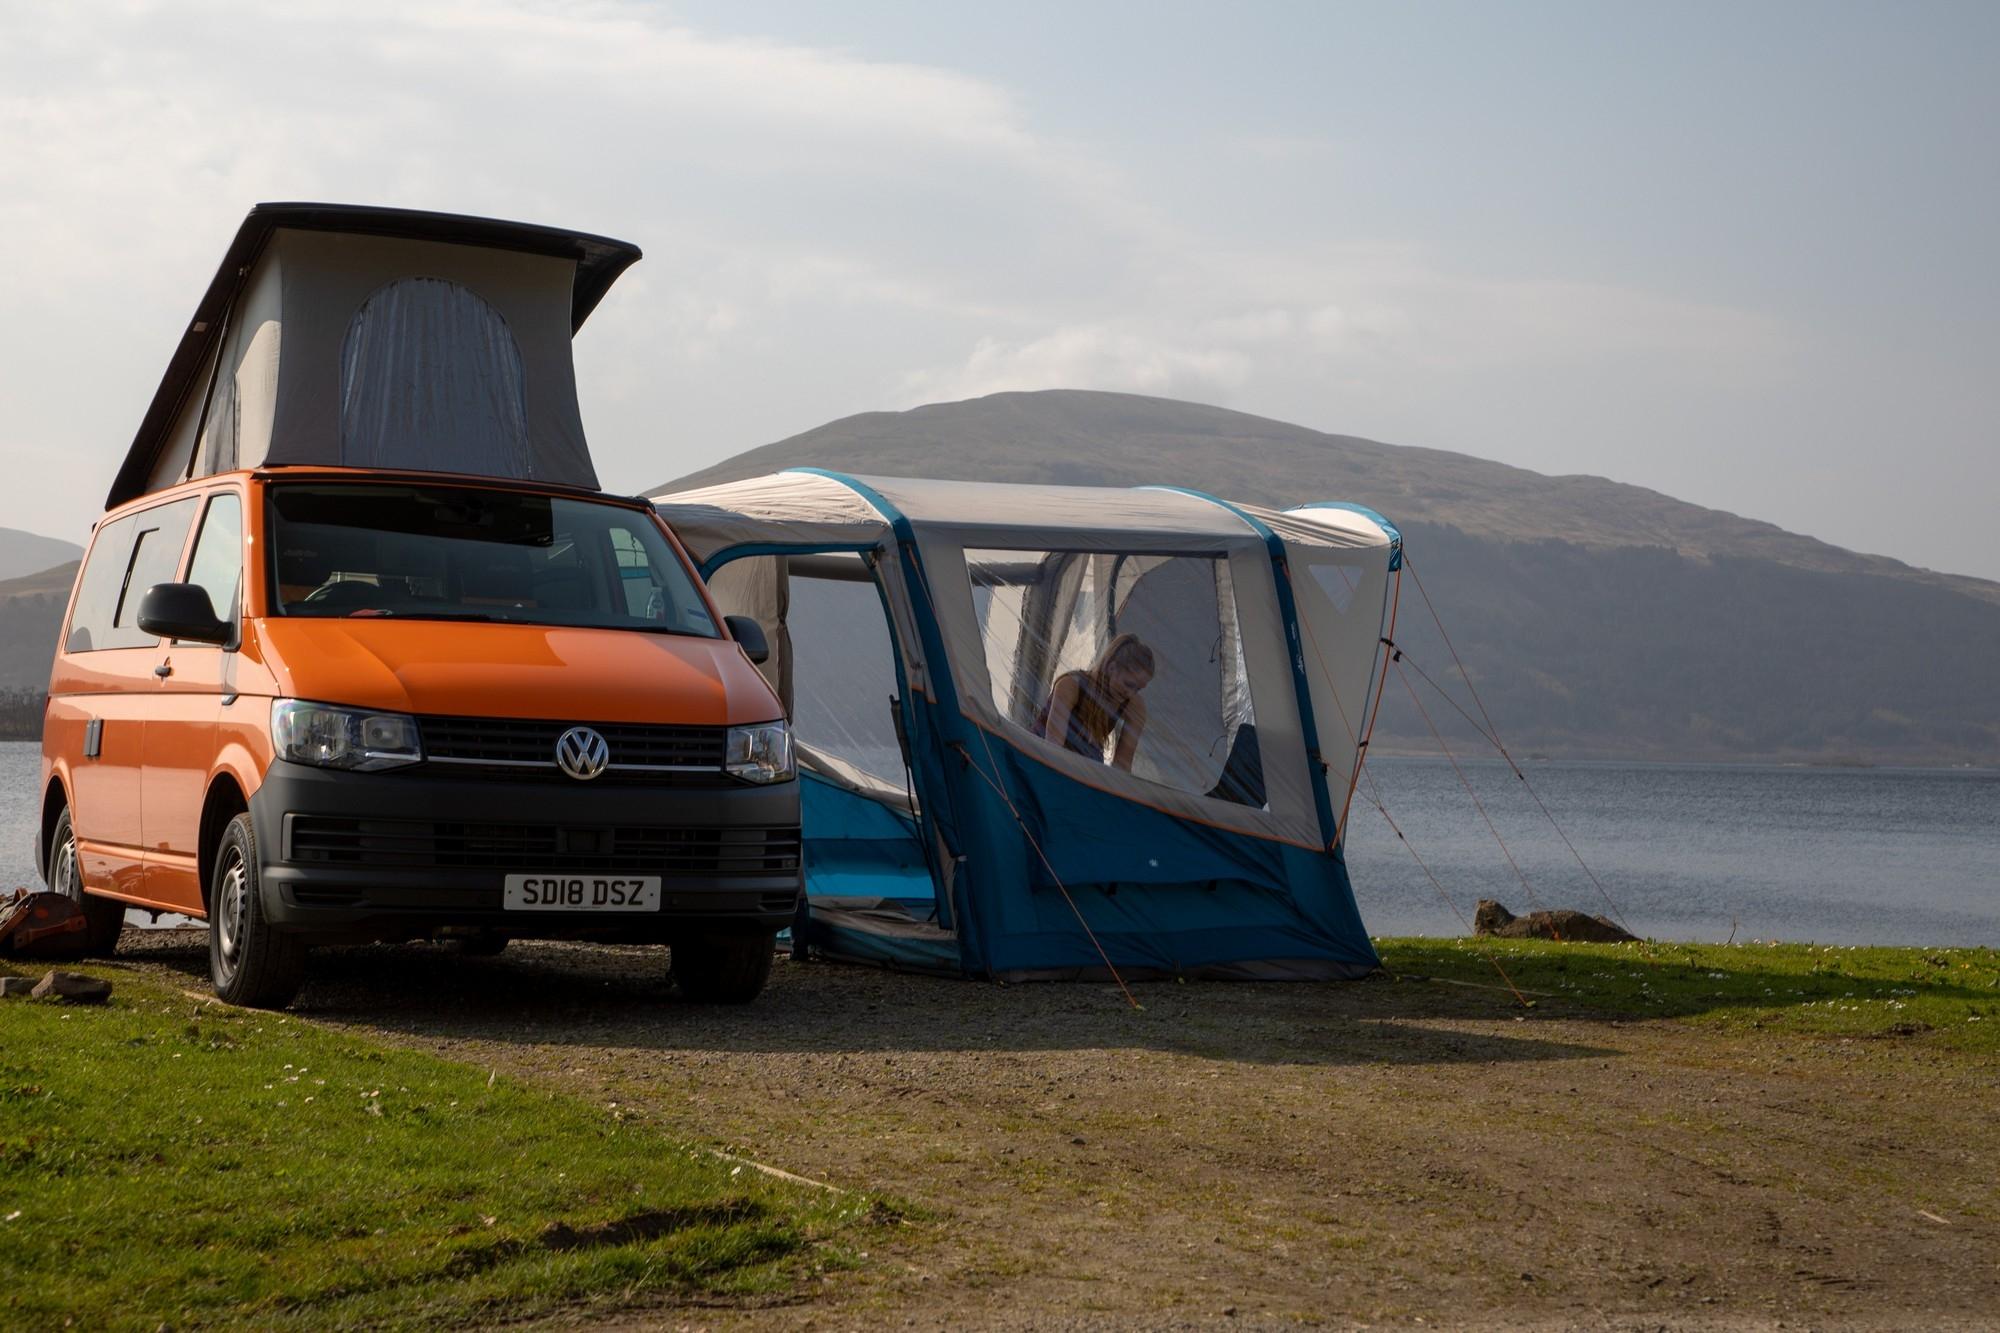 Vango Tolga VW Inflatable DriveAway Awning - 2020 Model